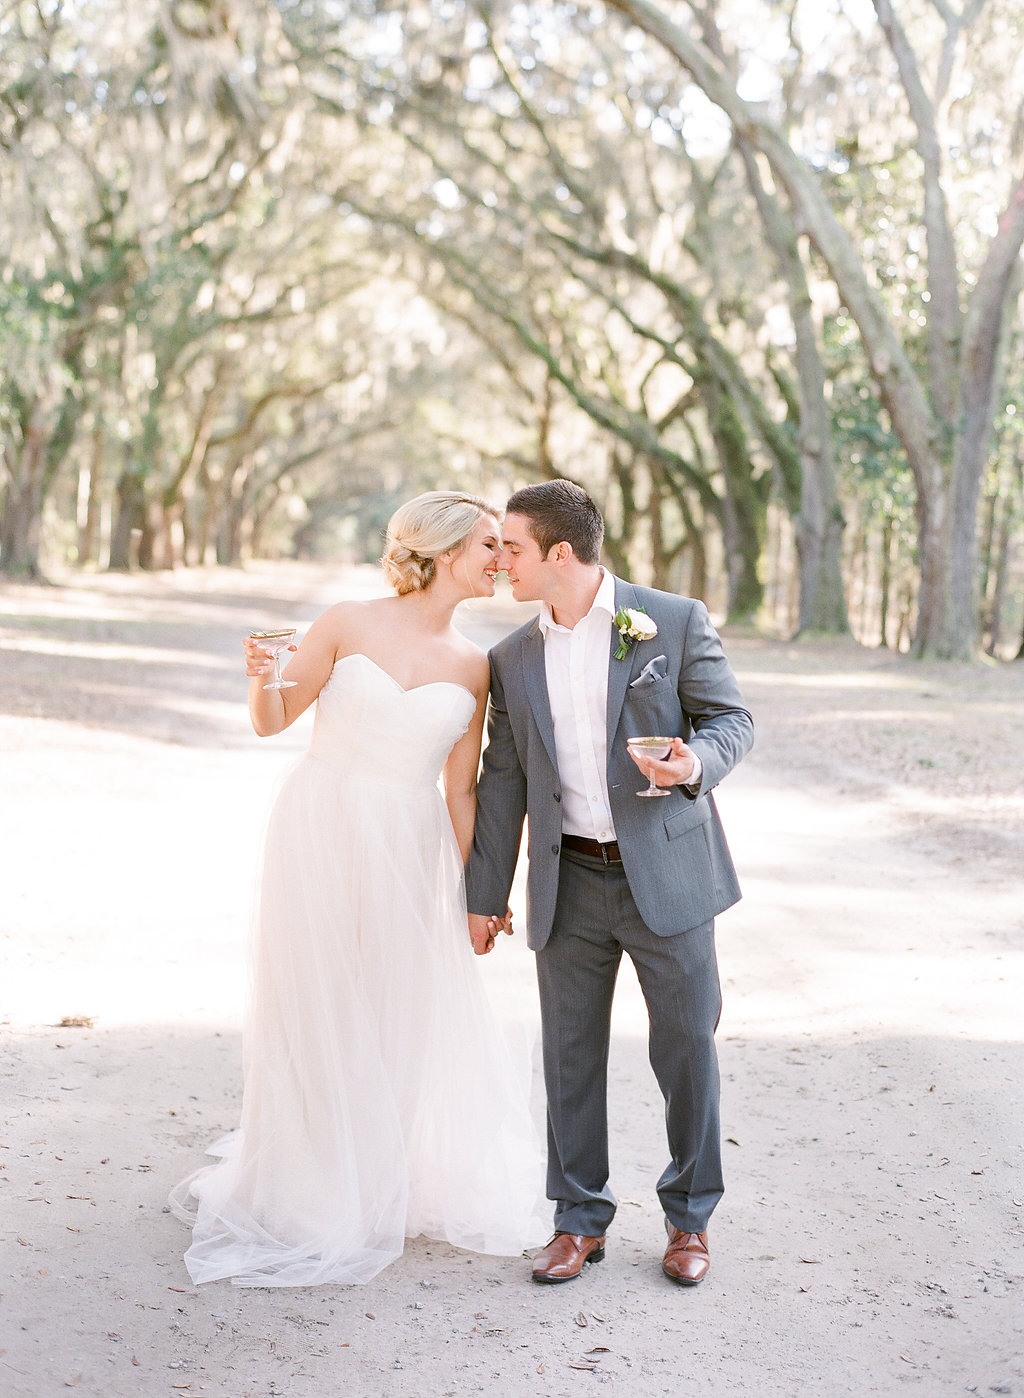 the-happy-bloom-wormsloe-wedding-savannah-wedding-ivory-and-beau-bridal-boutique-savannah-wedding-dresses-savannah-bridal-boutique-georgia-bridal-boutique-design-studio-south-sunset-wedding-blush-by-hayley-paige-candi-1550-blush-wedding-dress-12.jpg